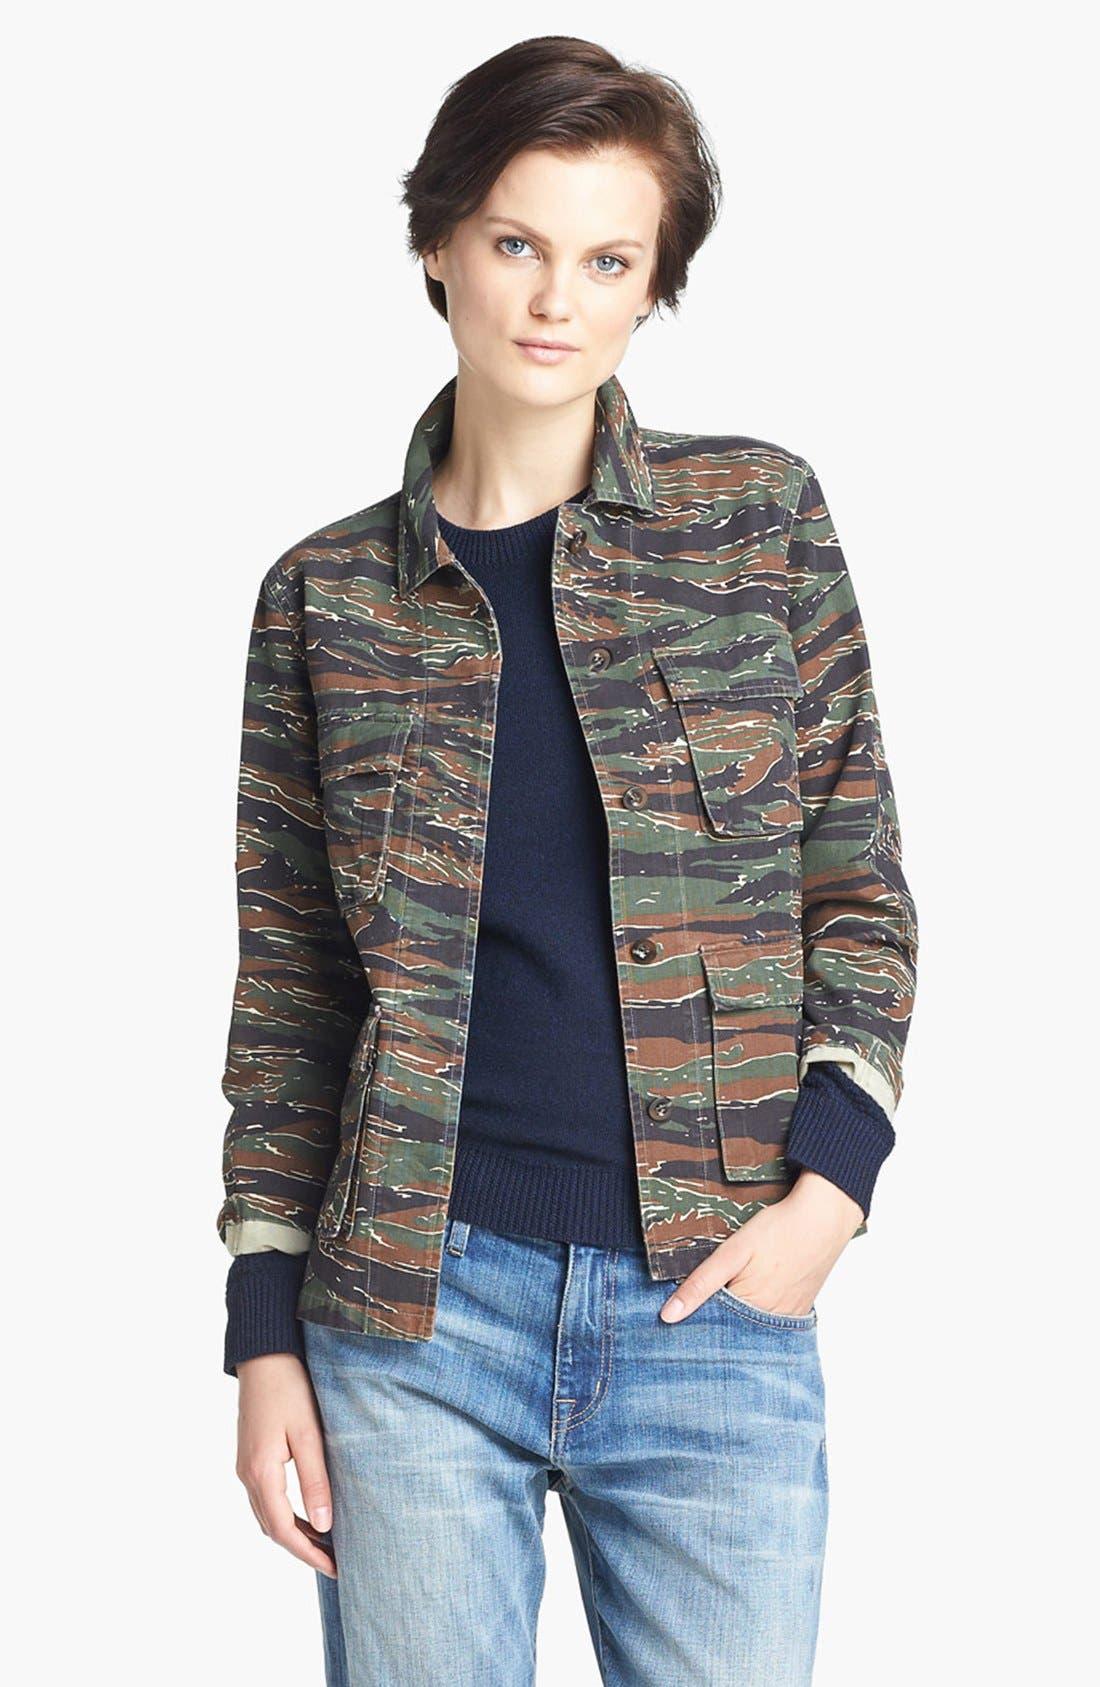 Main Image - A.P.C. Vintage Camouflage Jacket